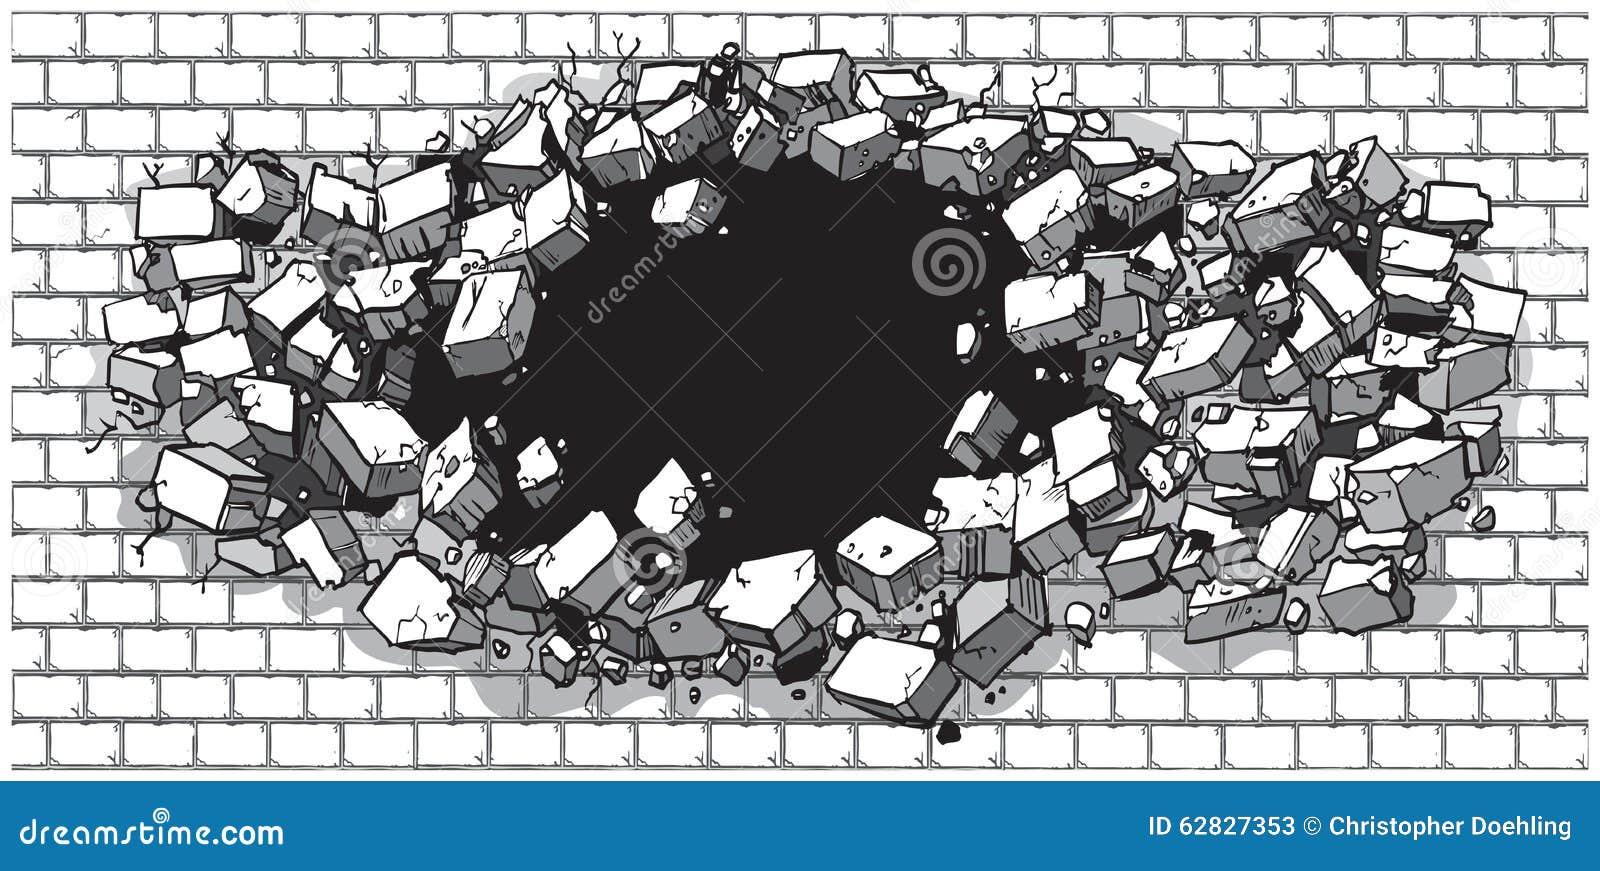 Agujero que se rompe a través de la pared de ladrillo ancha